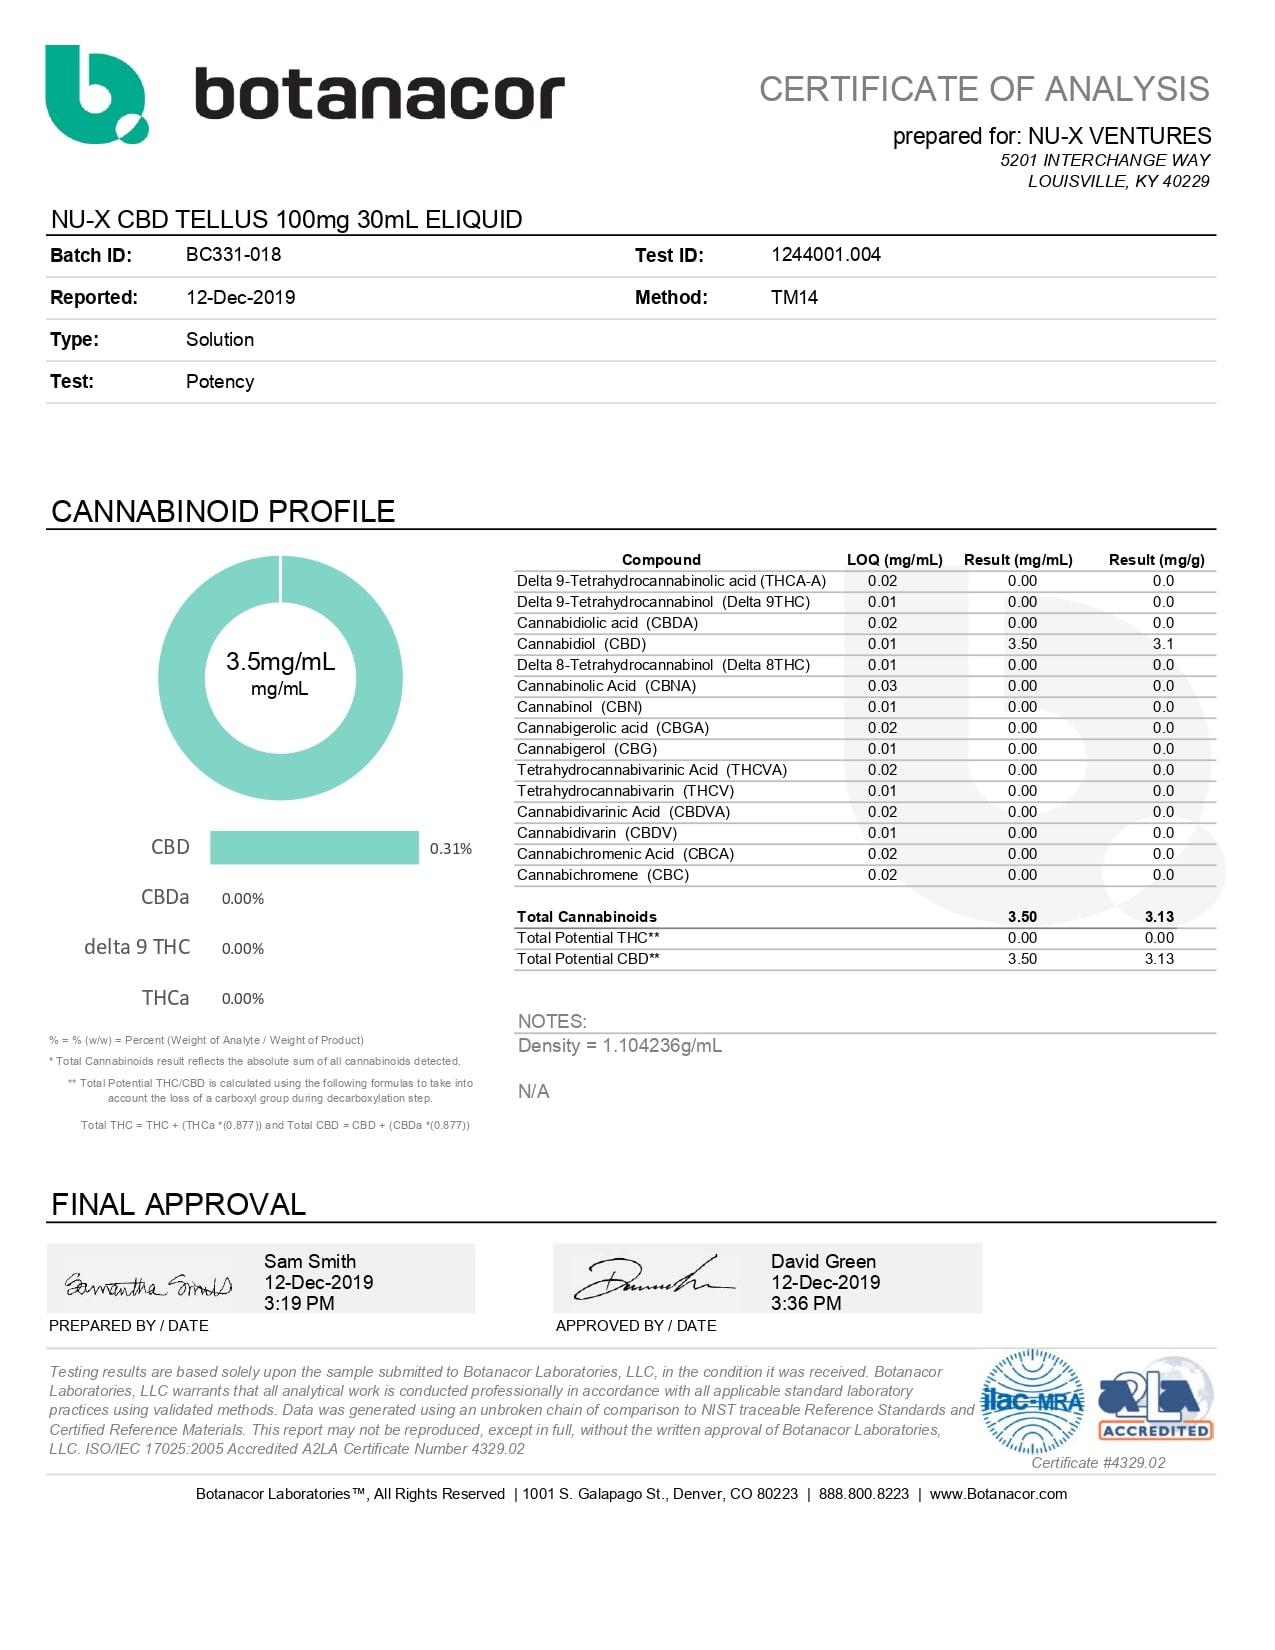 NU-X CBD eLiquid Banana Caramel - Tellus Lab Report 100mg